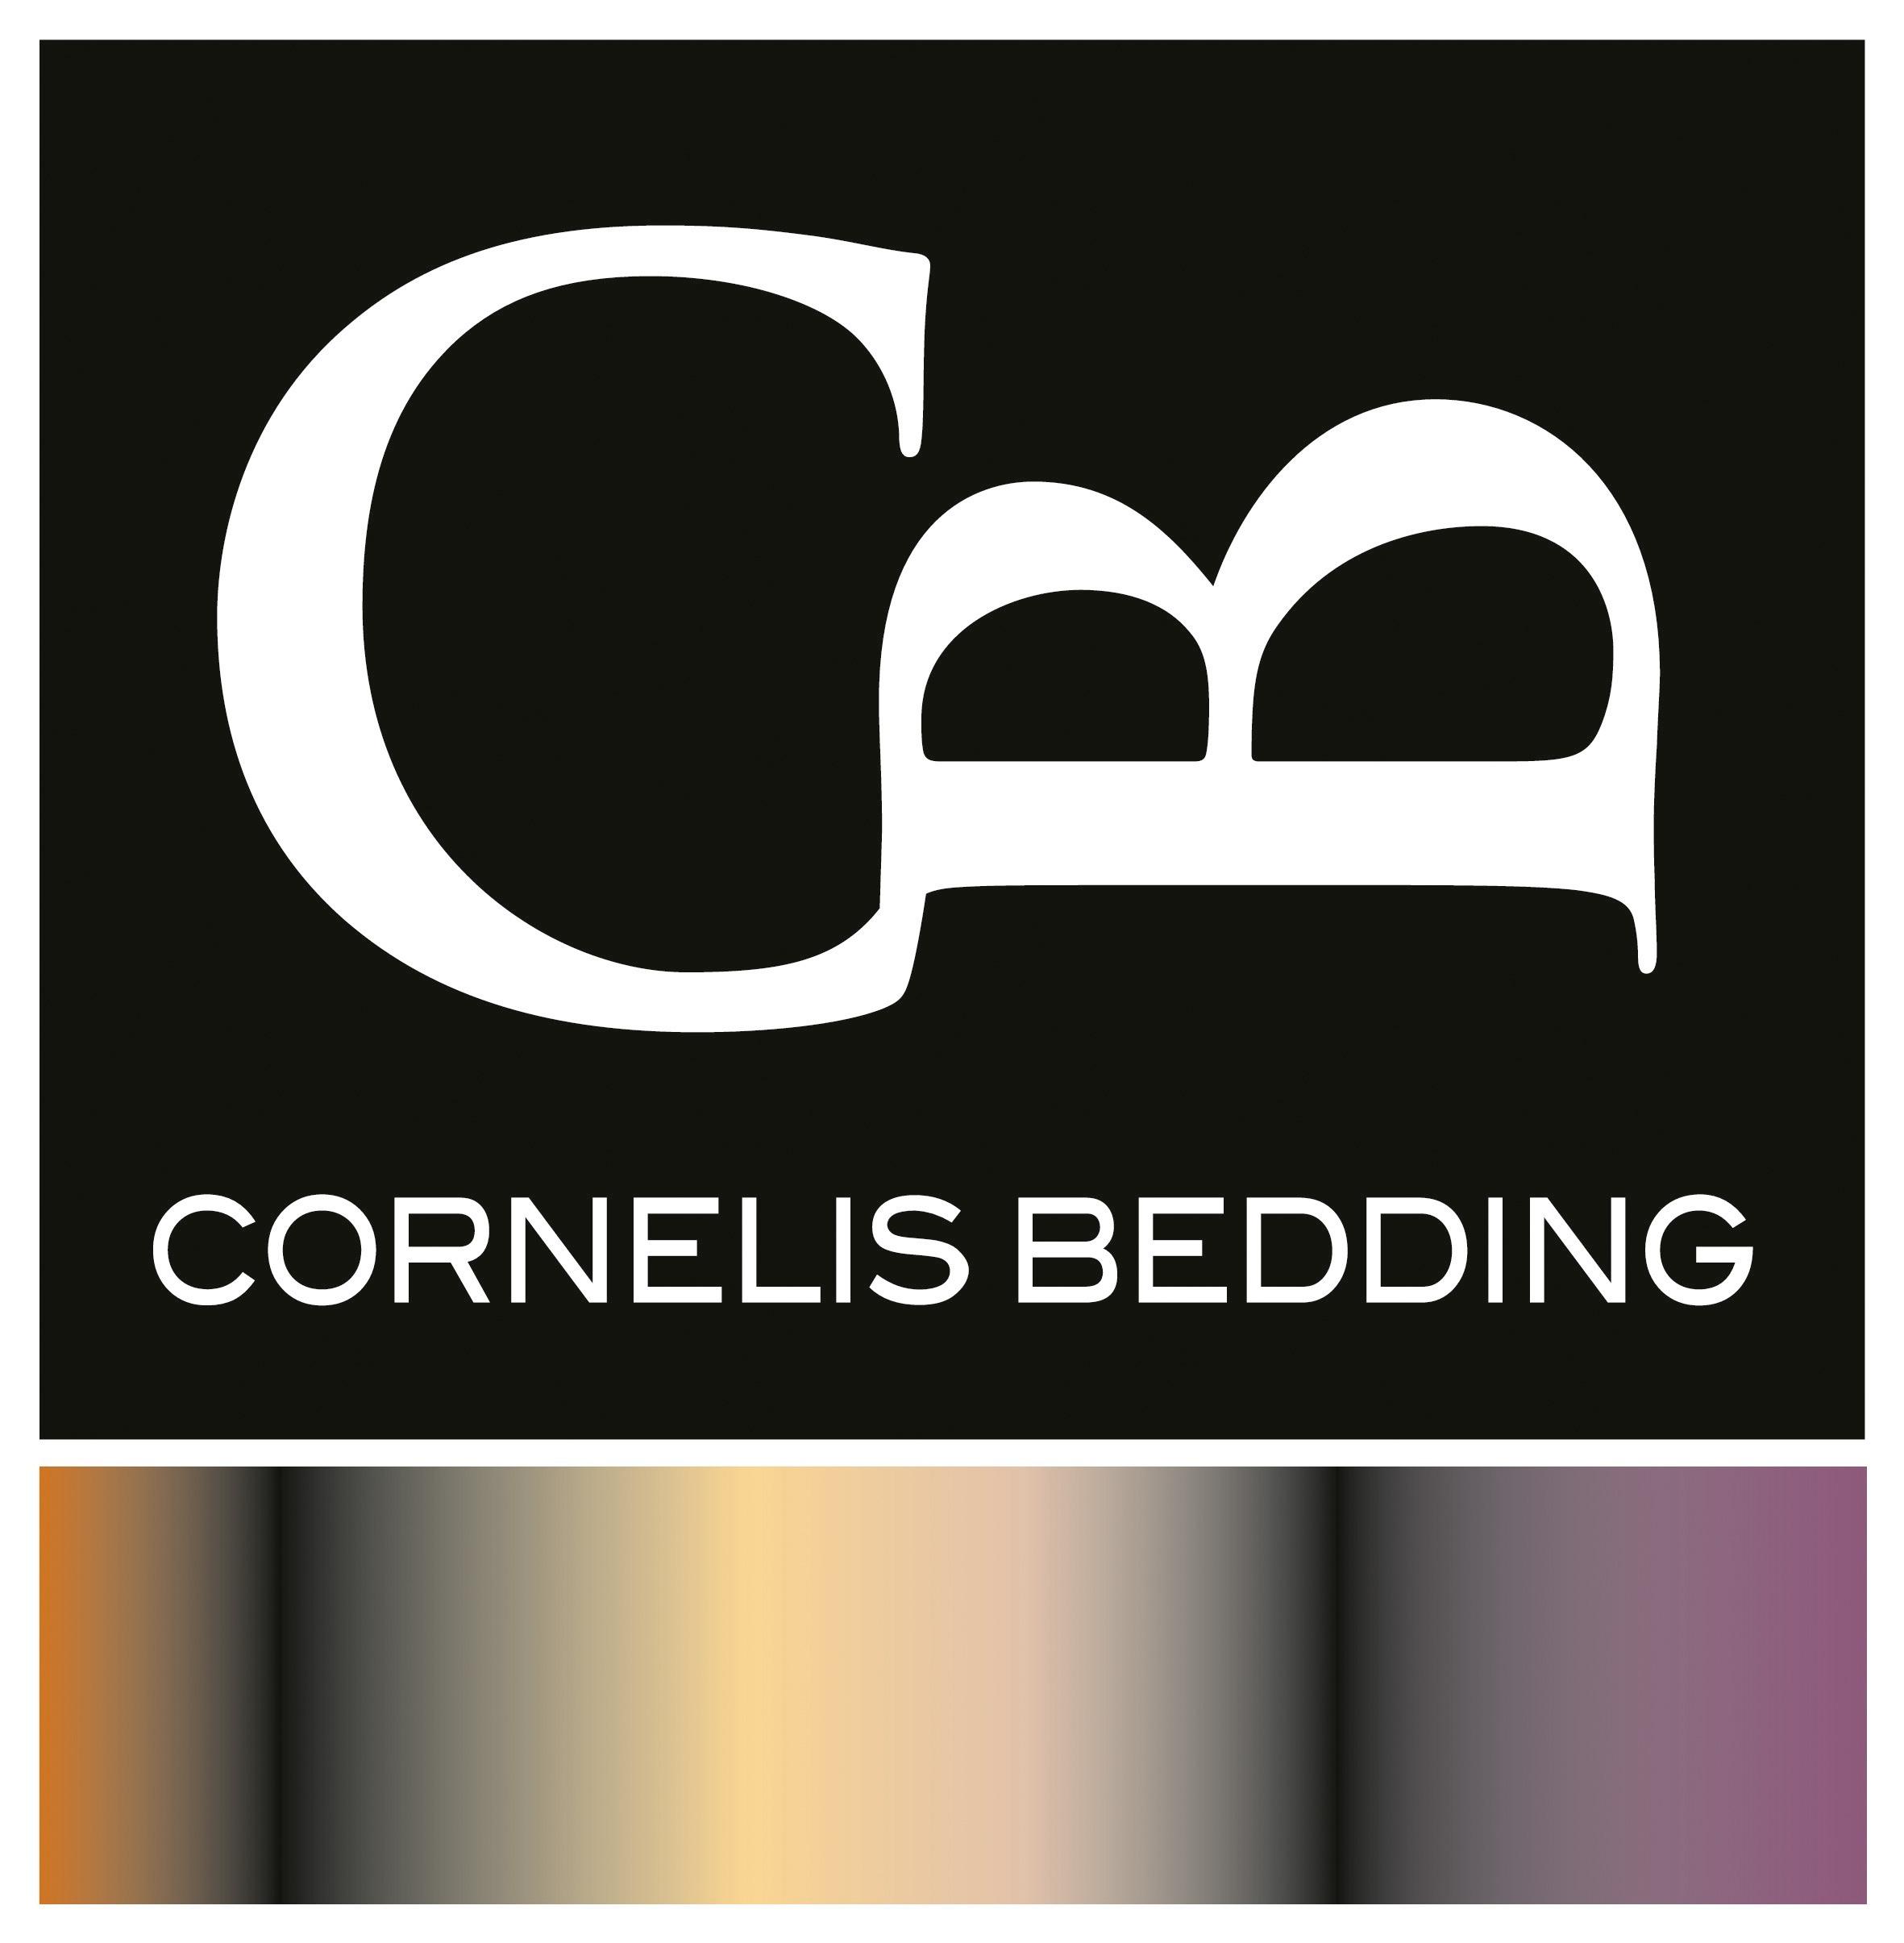 Cornelis_Bedding_logo_2_bedding_wit_vierkant_rgb